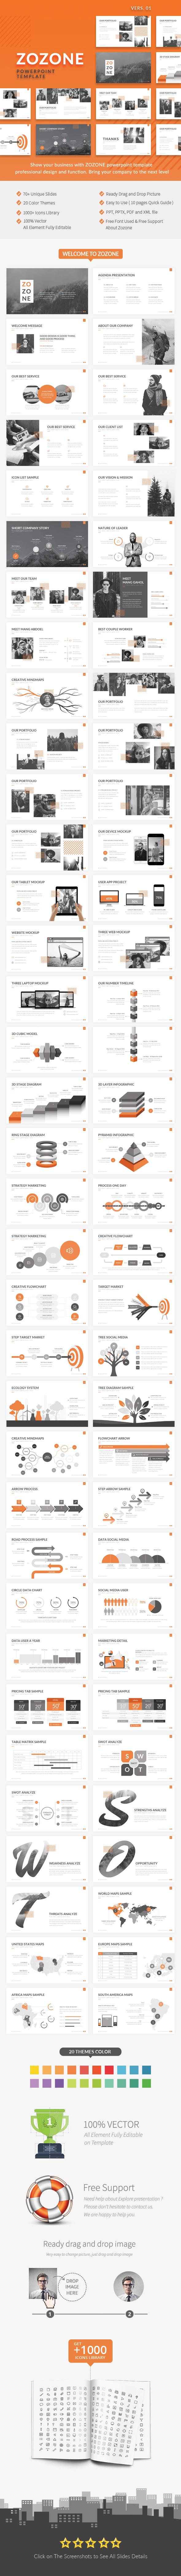 ZOZONE - Simple Modern Powerpoint Presentation Template - Business PowerPoint Templates